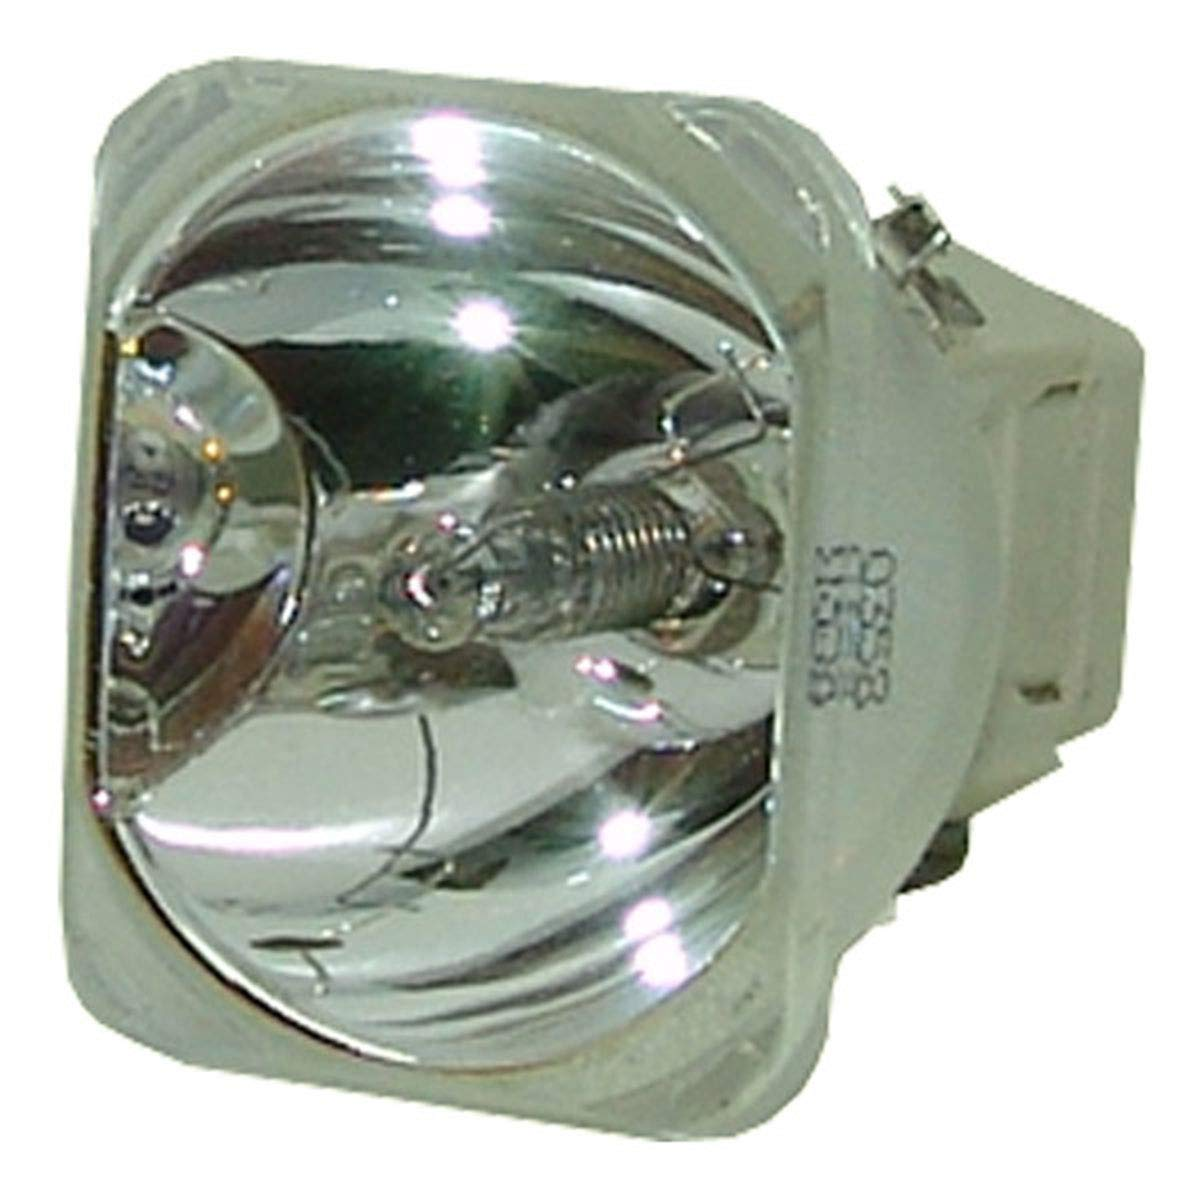 LYTIO プレミアム Optoma BL-FP165A プロジェクターランプ BLFP165A (オリジナルOEM電球) B07JW9BM6Z